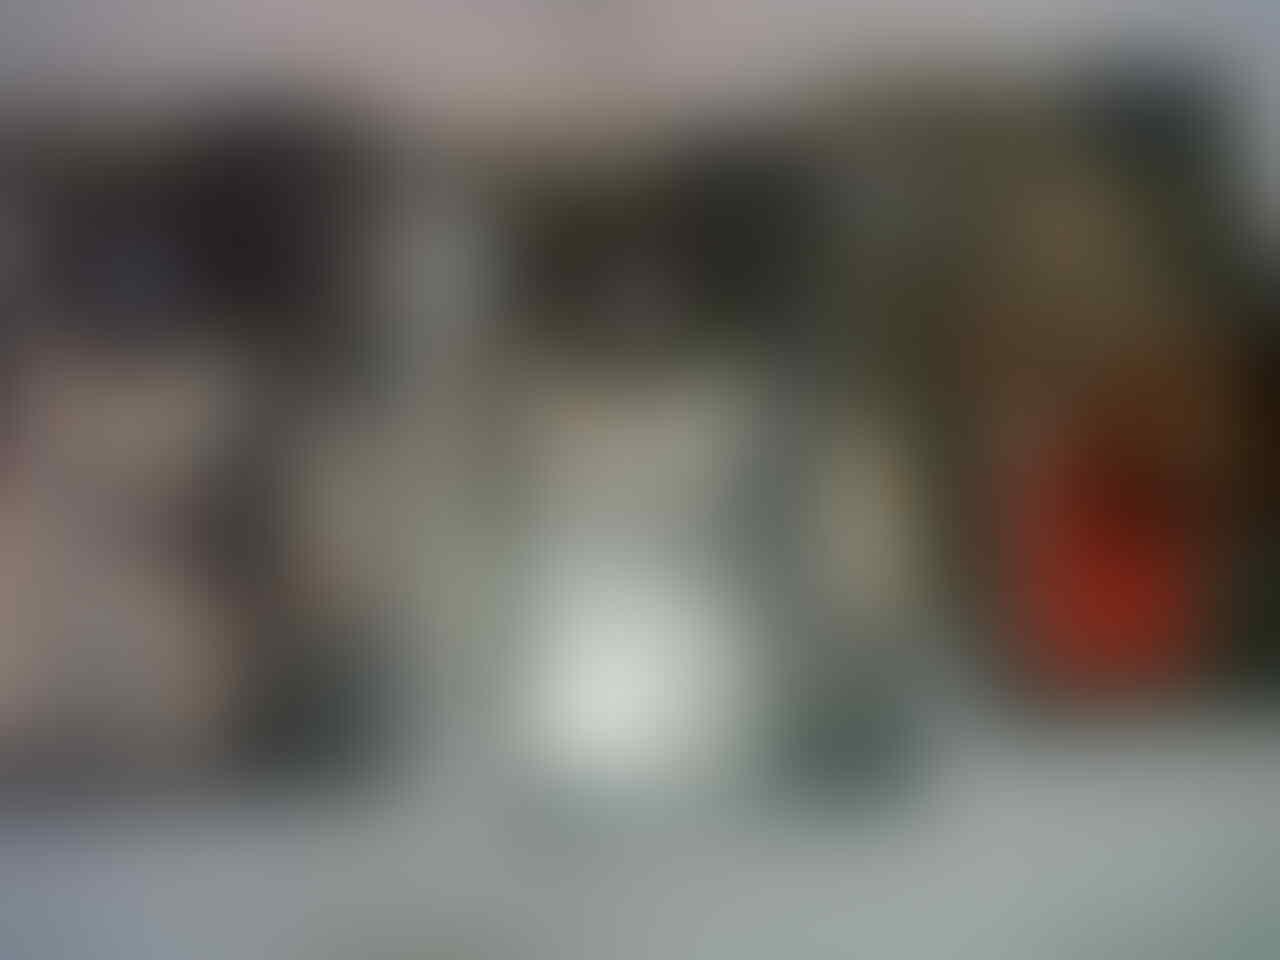 ATI X1600 XT dan ATI X1600 PRO